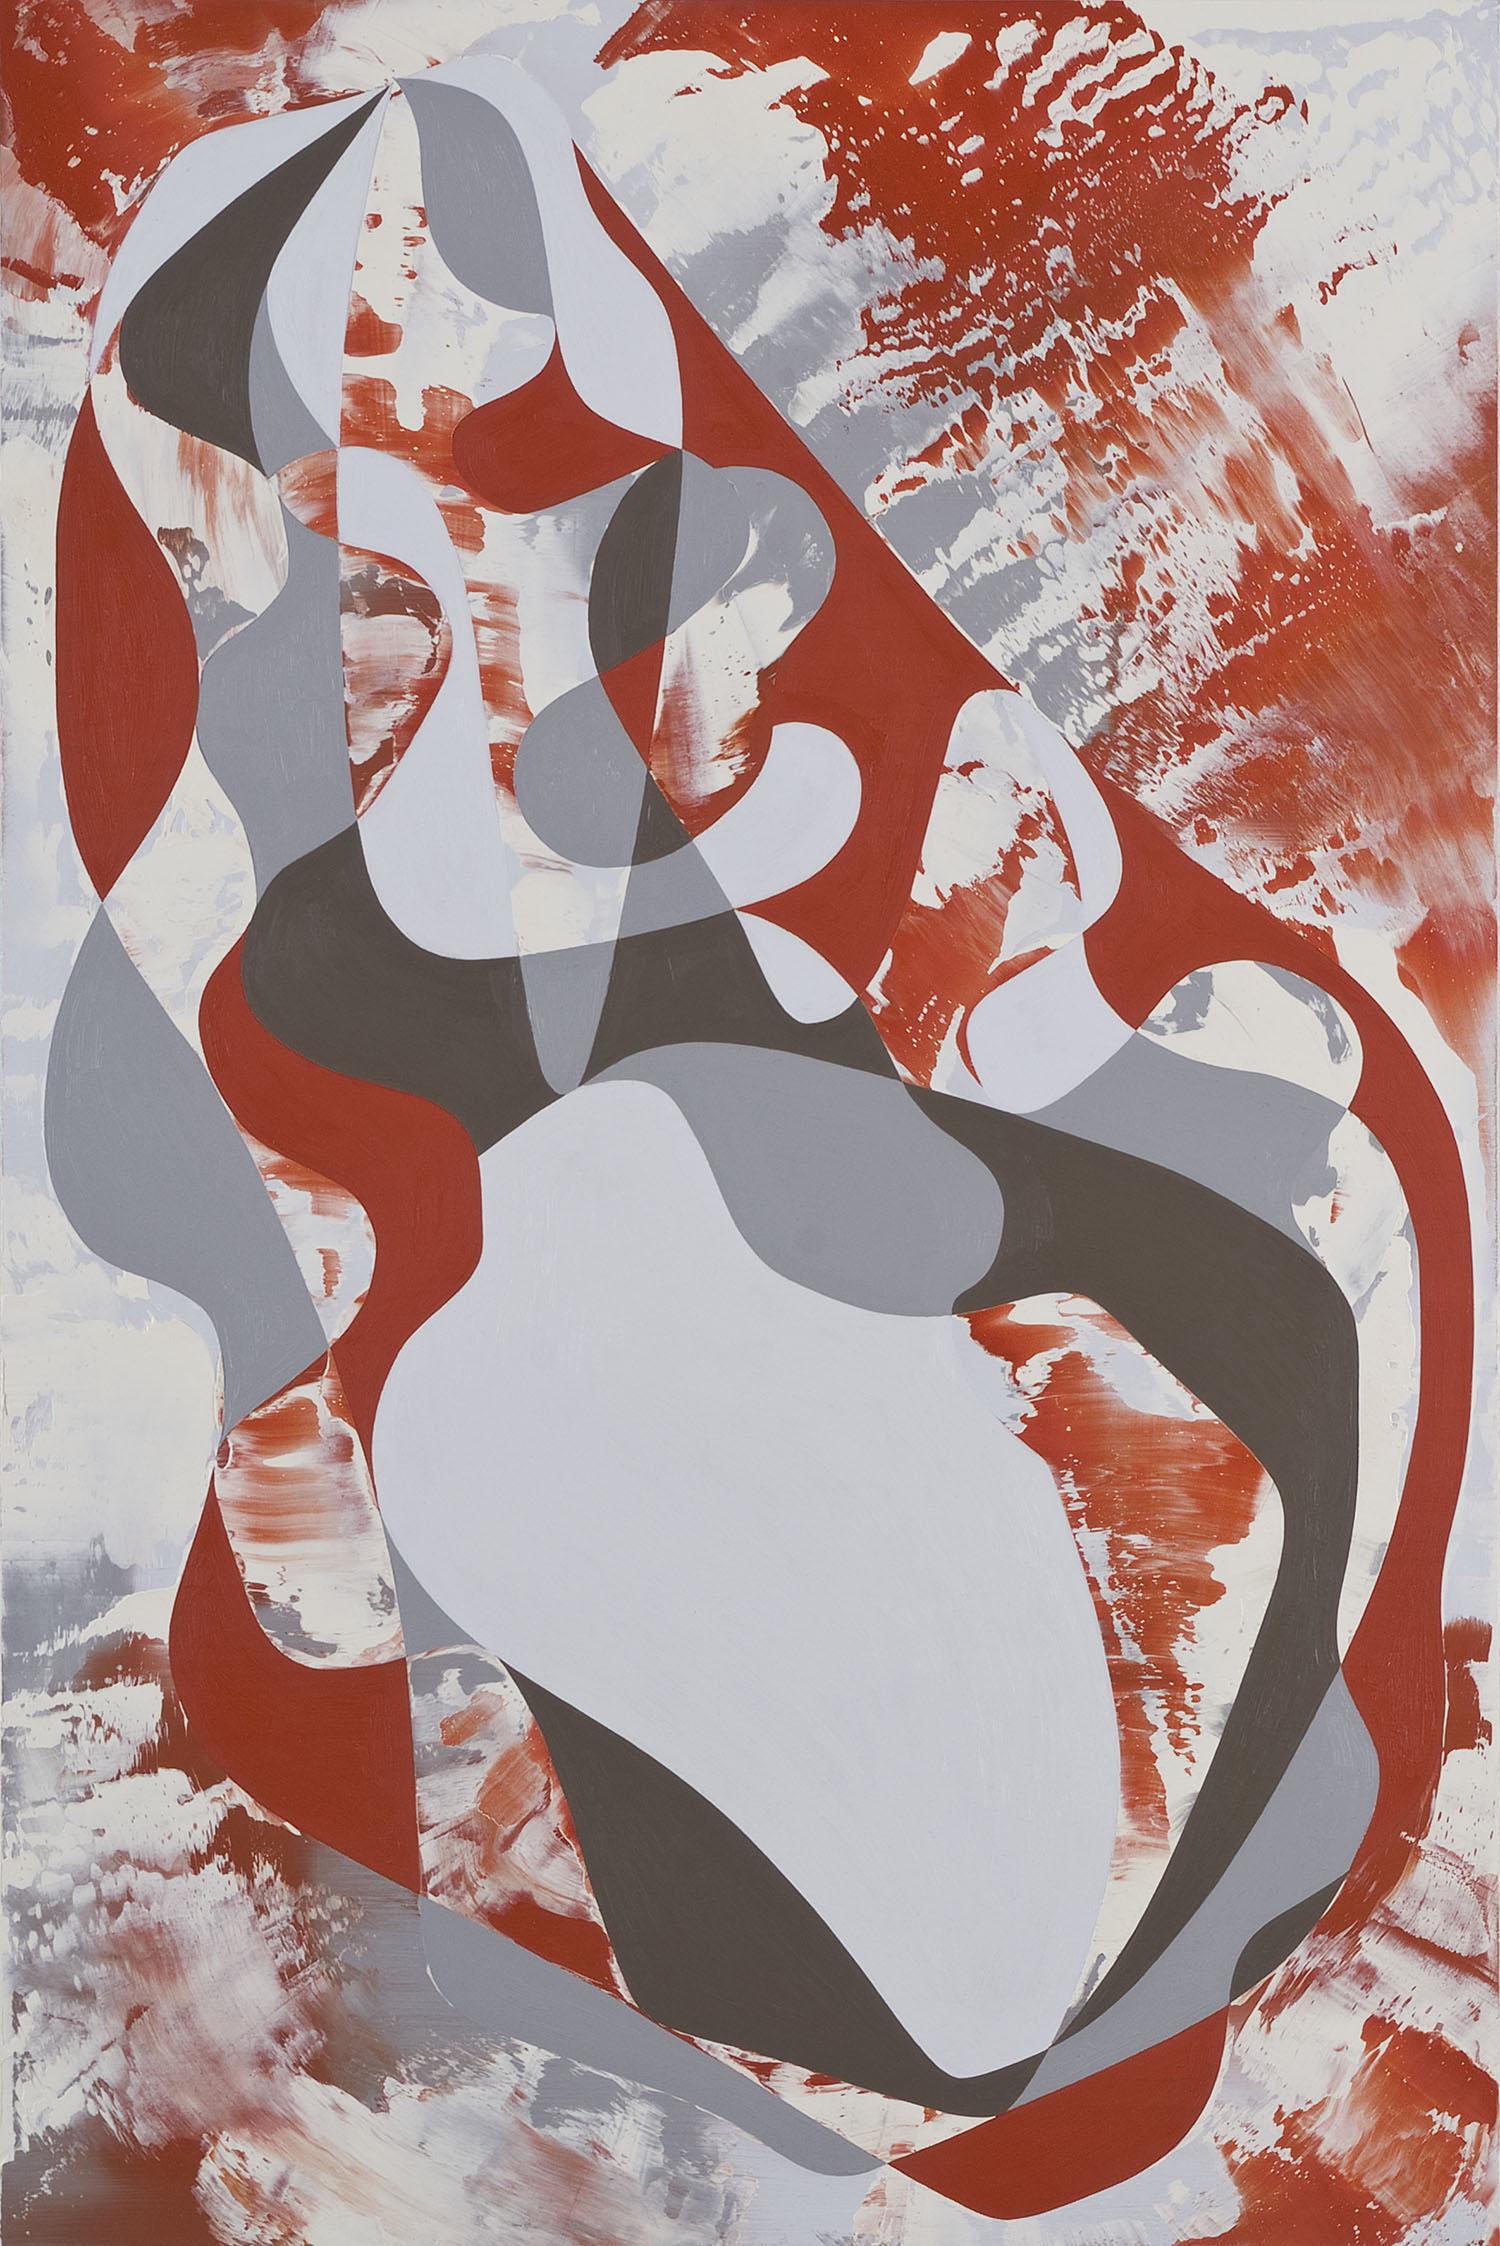 Untitled | 2007 | Öl auf Holz | 91,5 x 61 cm